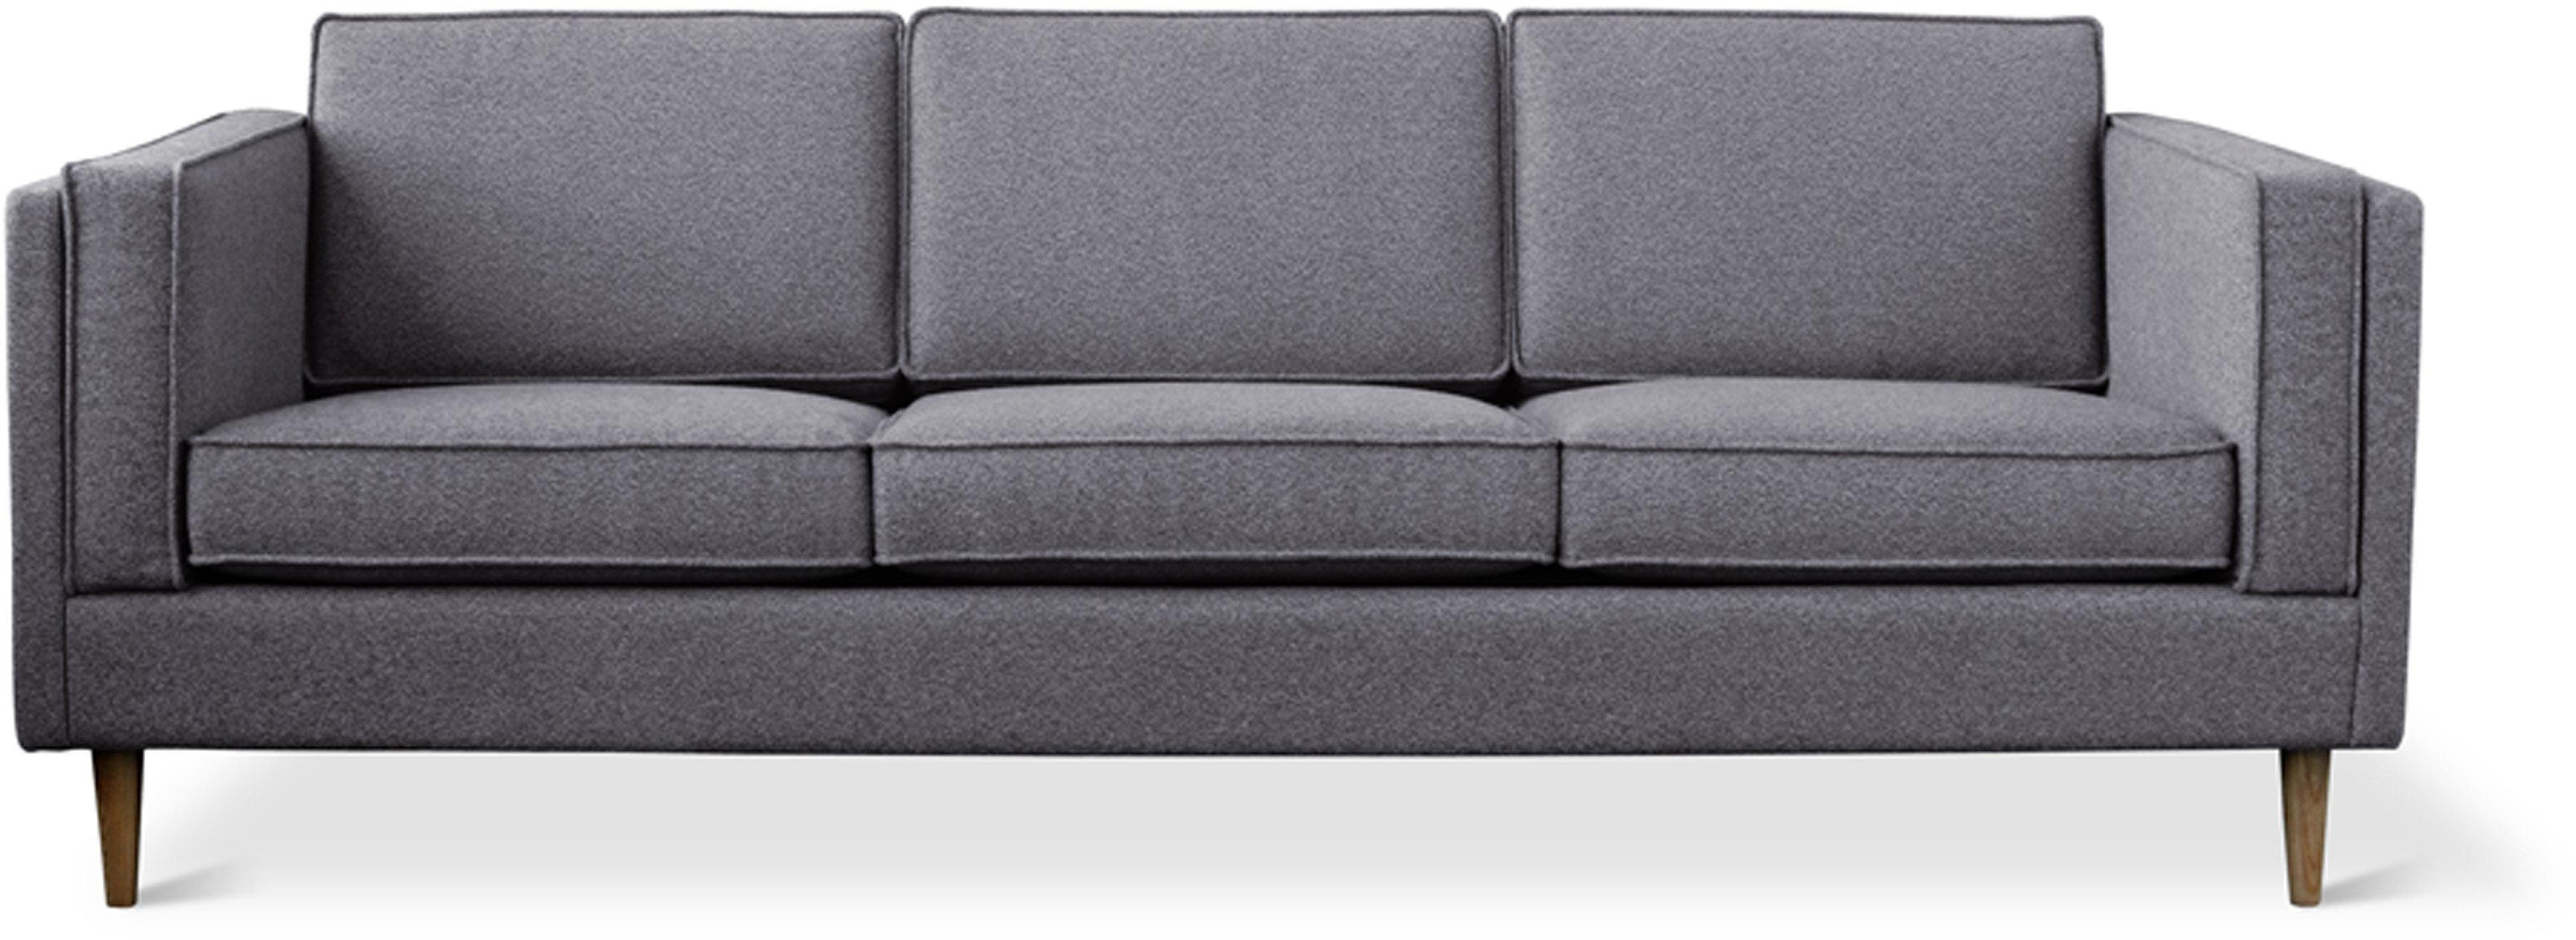 Viesso sofa Adelaide Sofa Viesso Adelaide Sofa